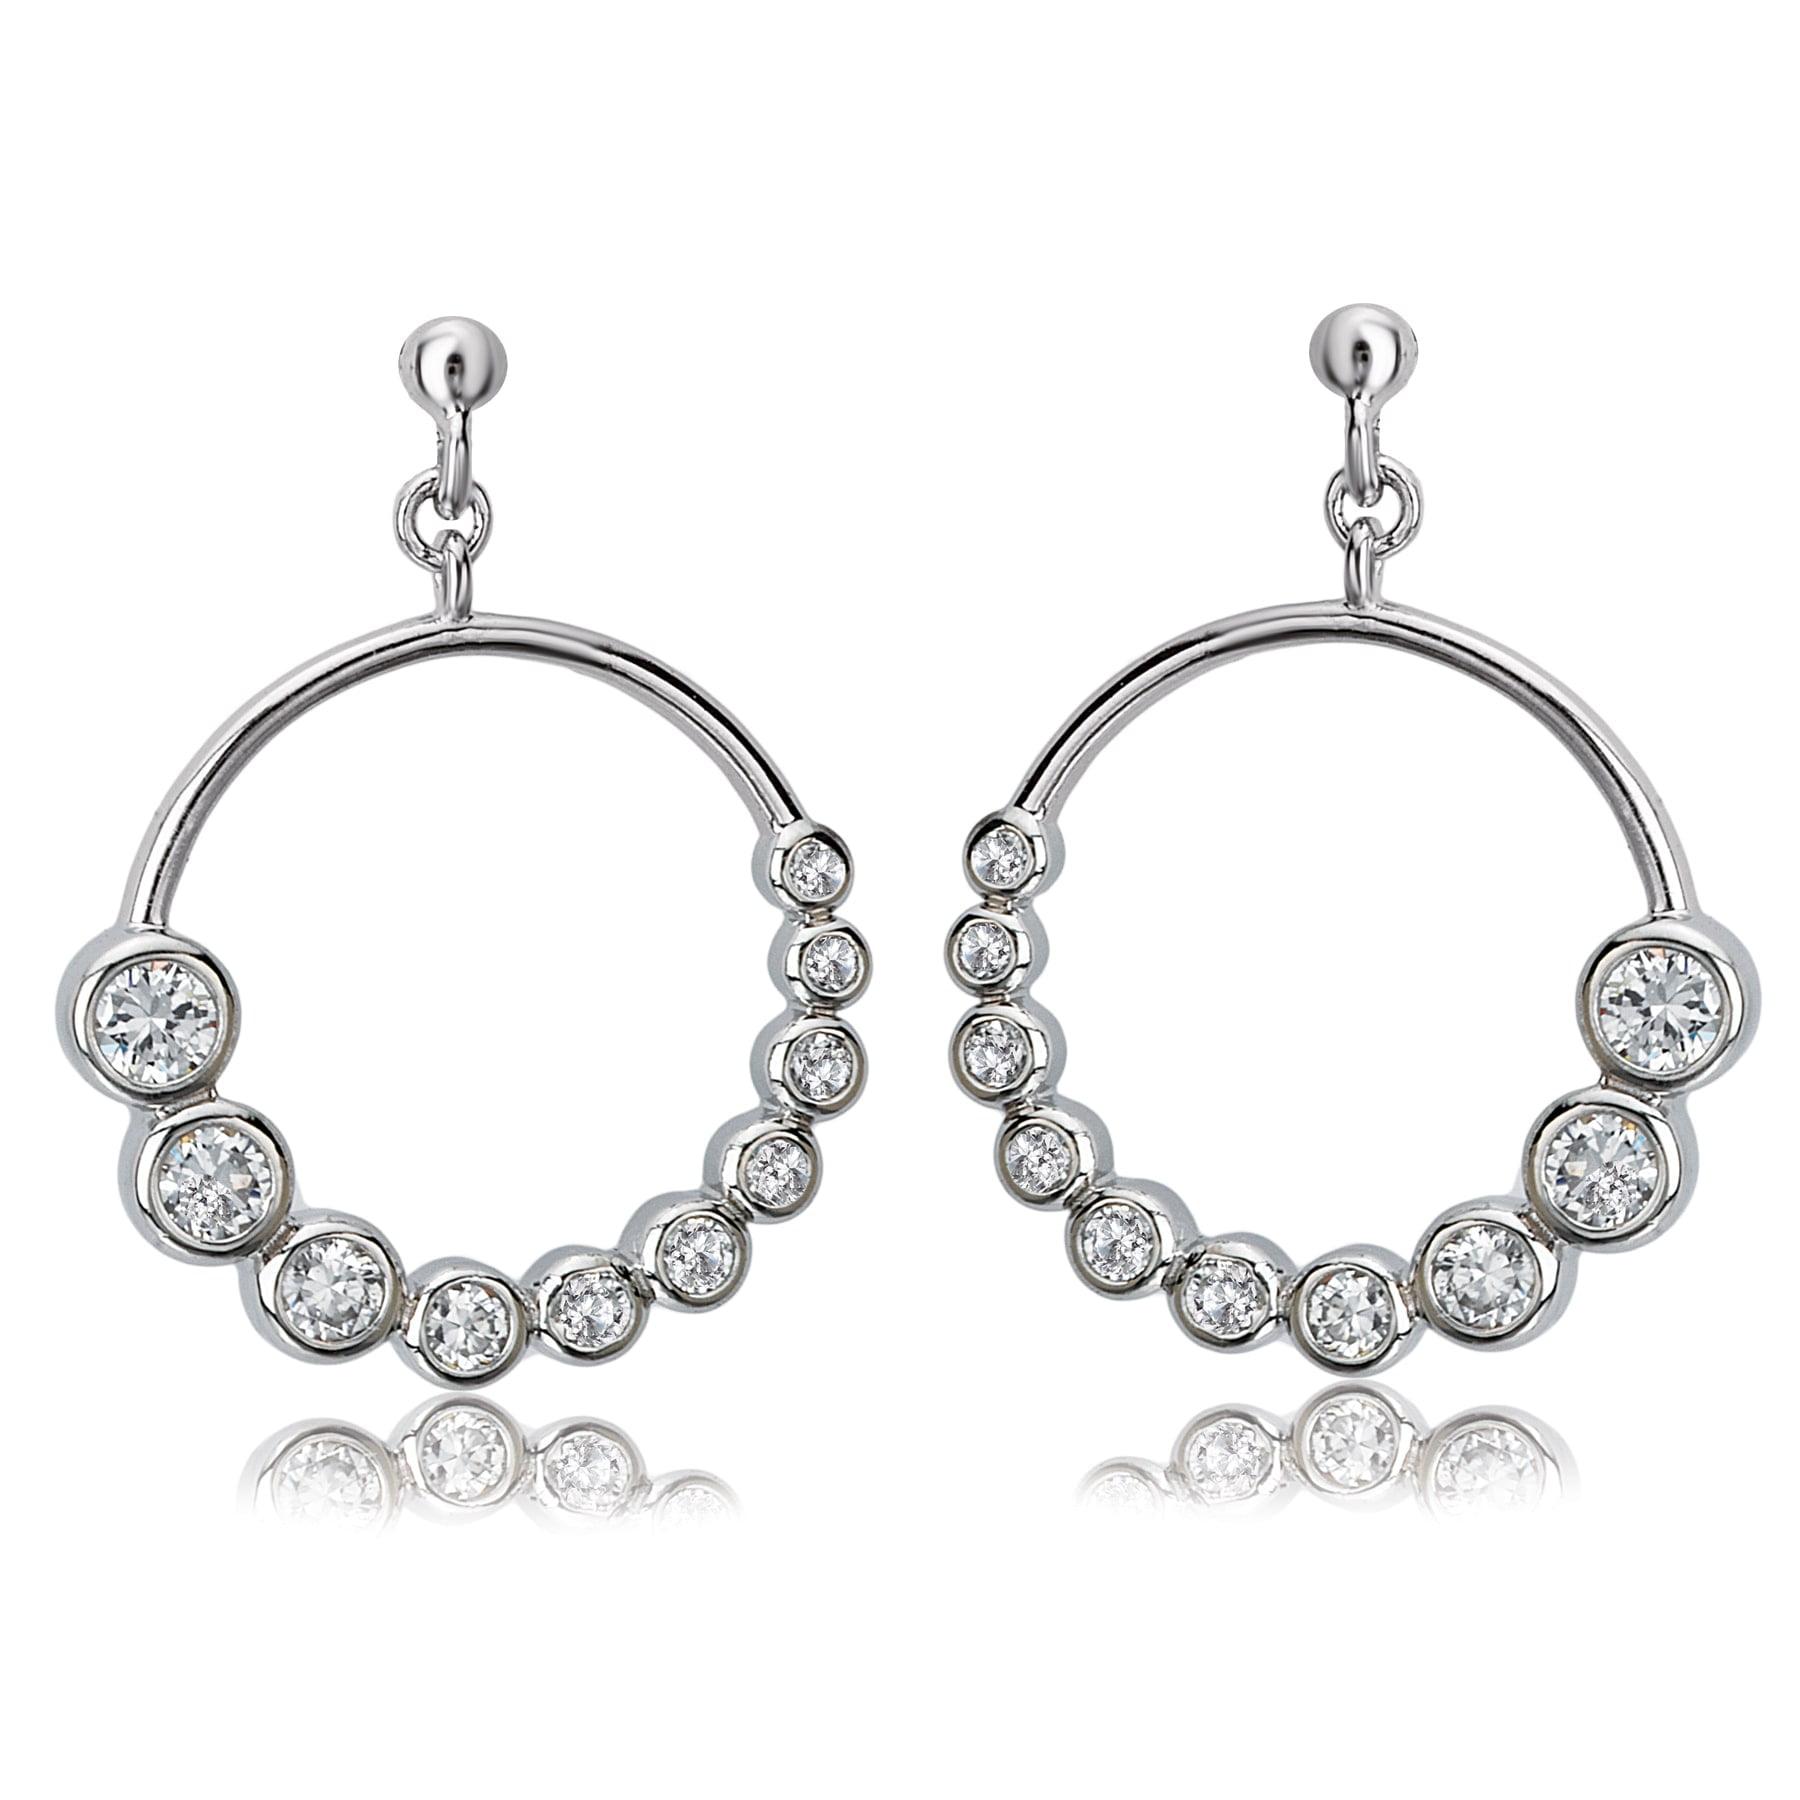 Avanti Sterling Silver Cubic Zirconia Journey Style Circular Dangle Earrings by Overstock